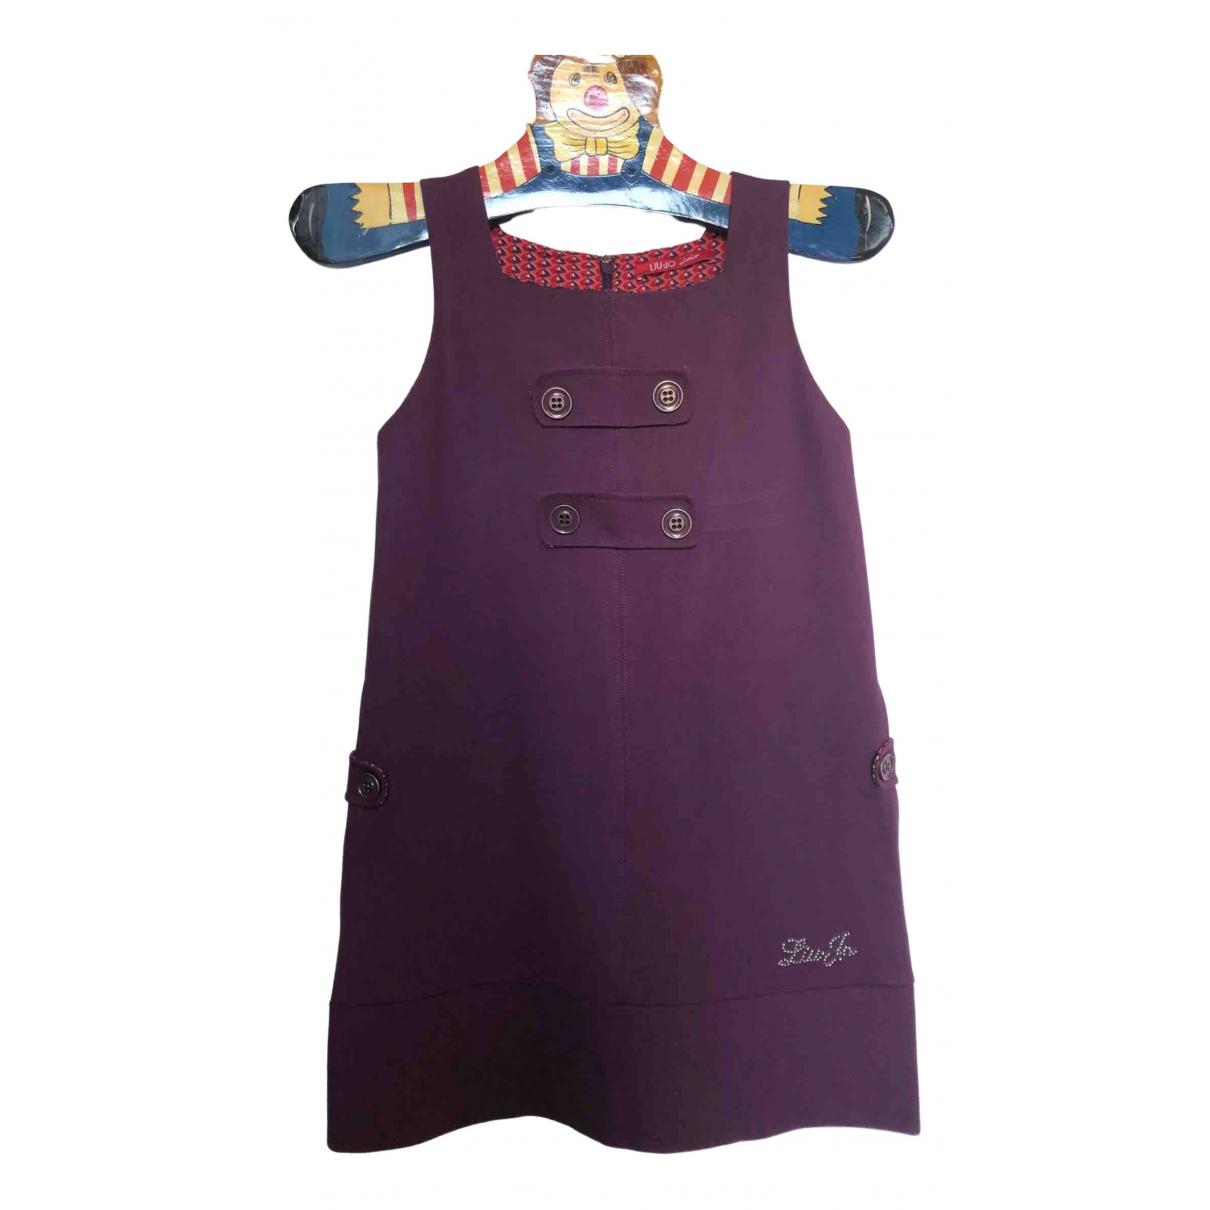 Liu.jo \N Purple dress for Kids 8 years - until 50 inches UK